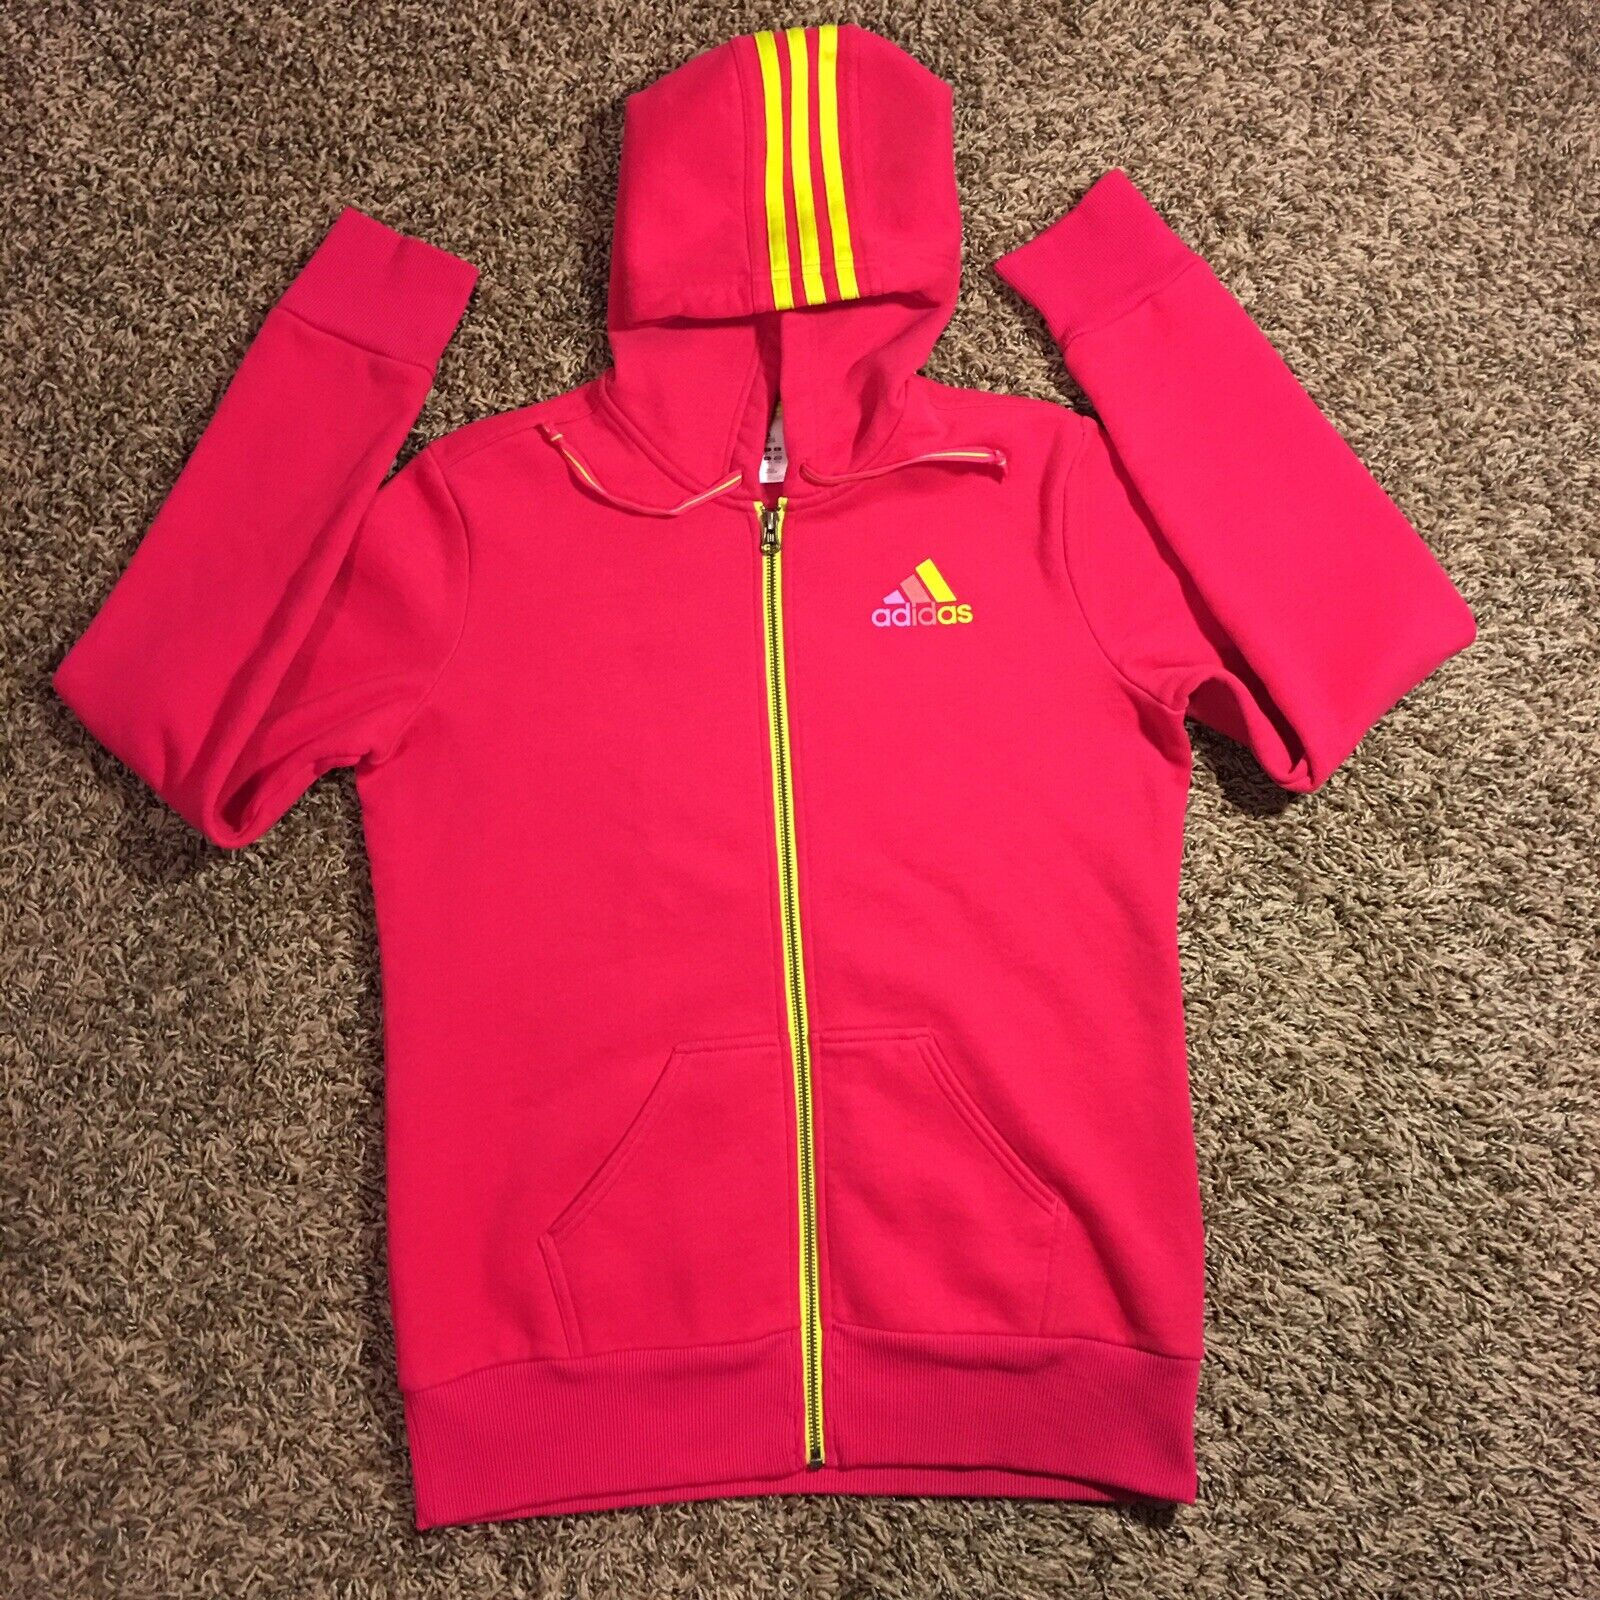 8136e4491 Adidas Women's Pink Sweatshirt Hoodie Full Full Full Zip Size (Medium)  c977dd